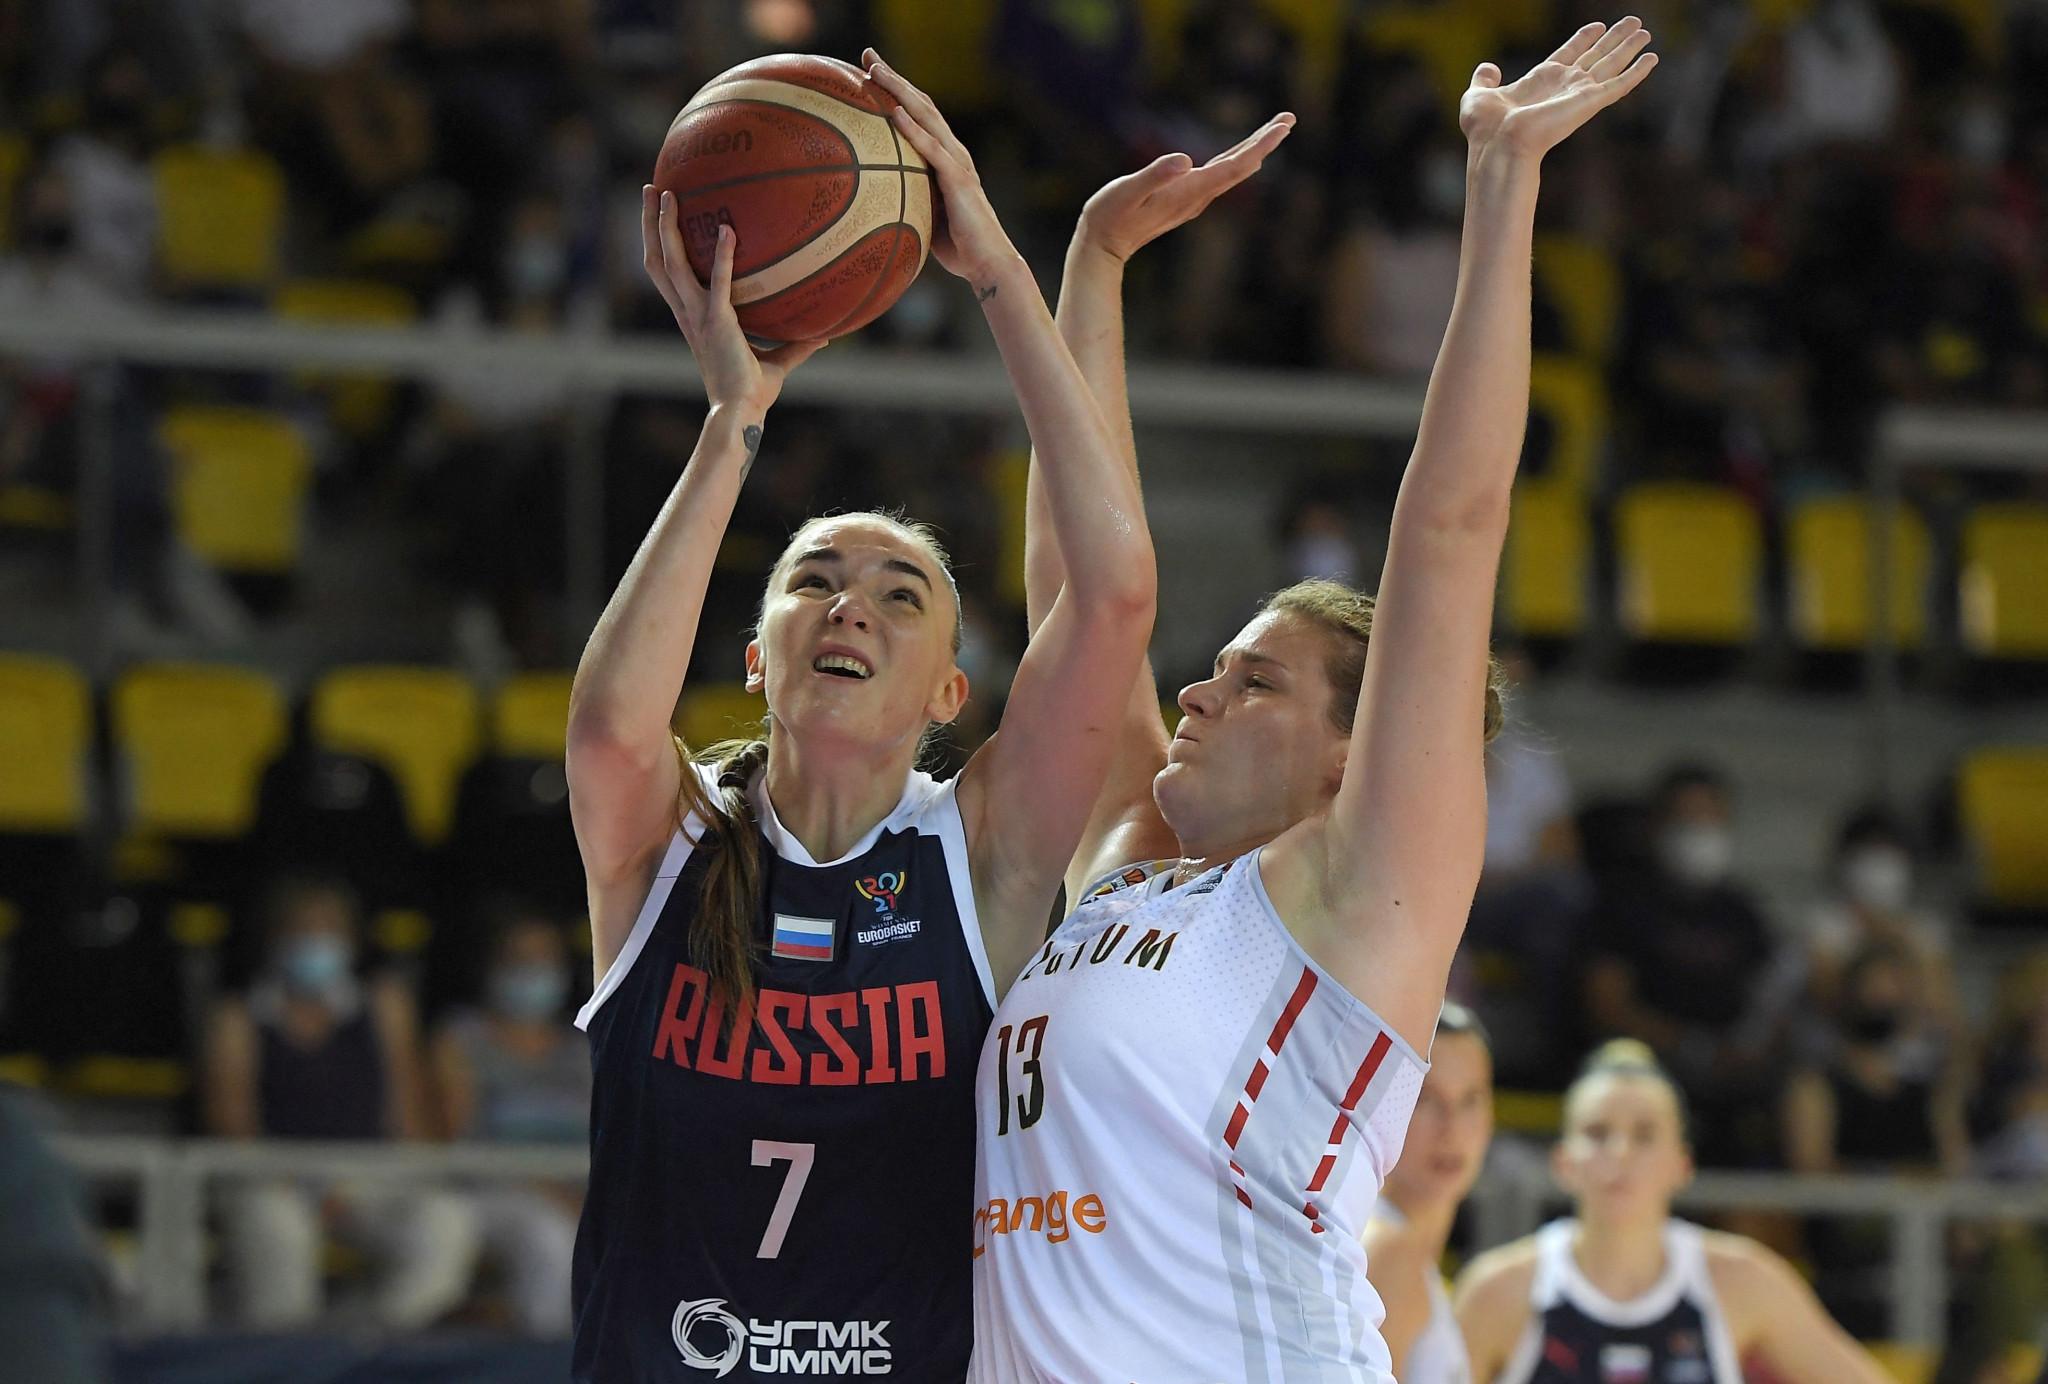 Russian women's basketball captain named as Yekaterinburg 2023 ambassador